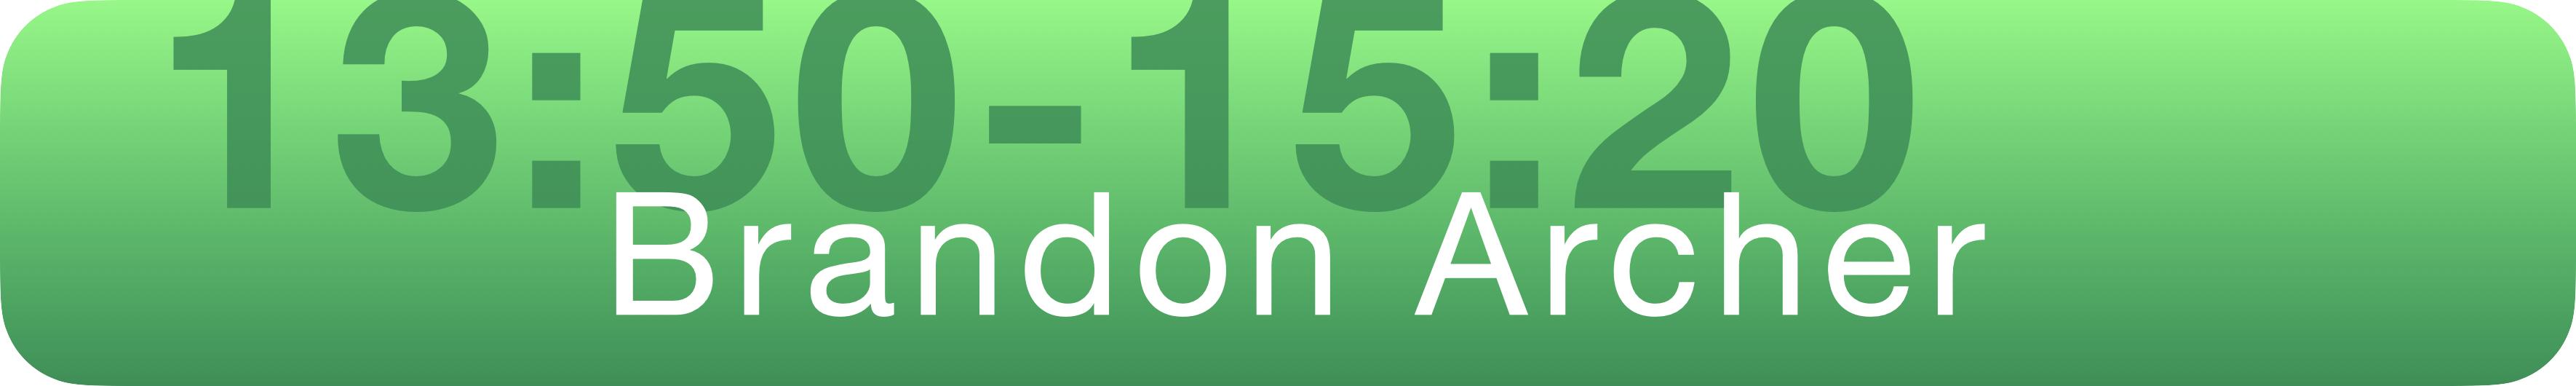 Brandon Archer Advising 1350 button